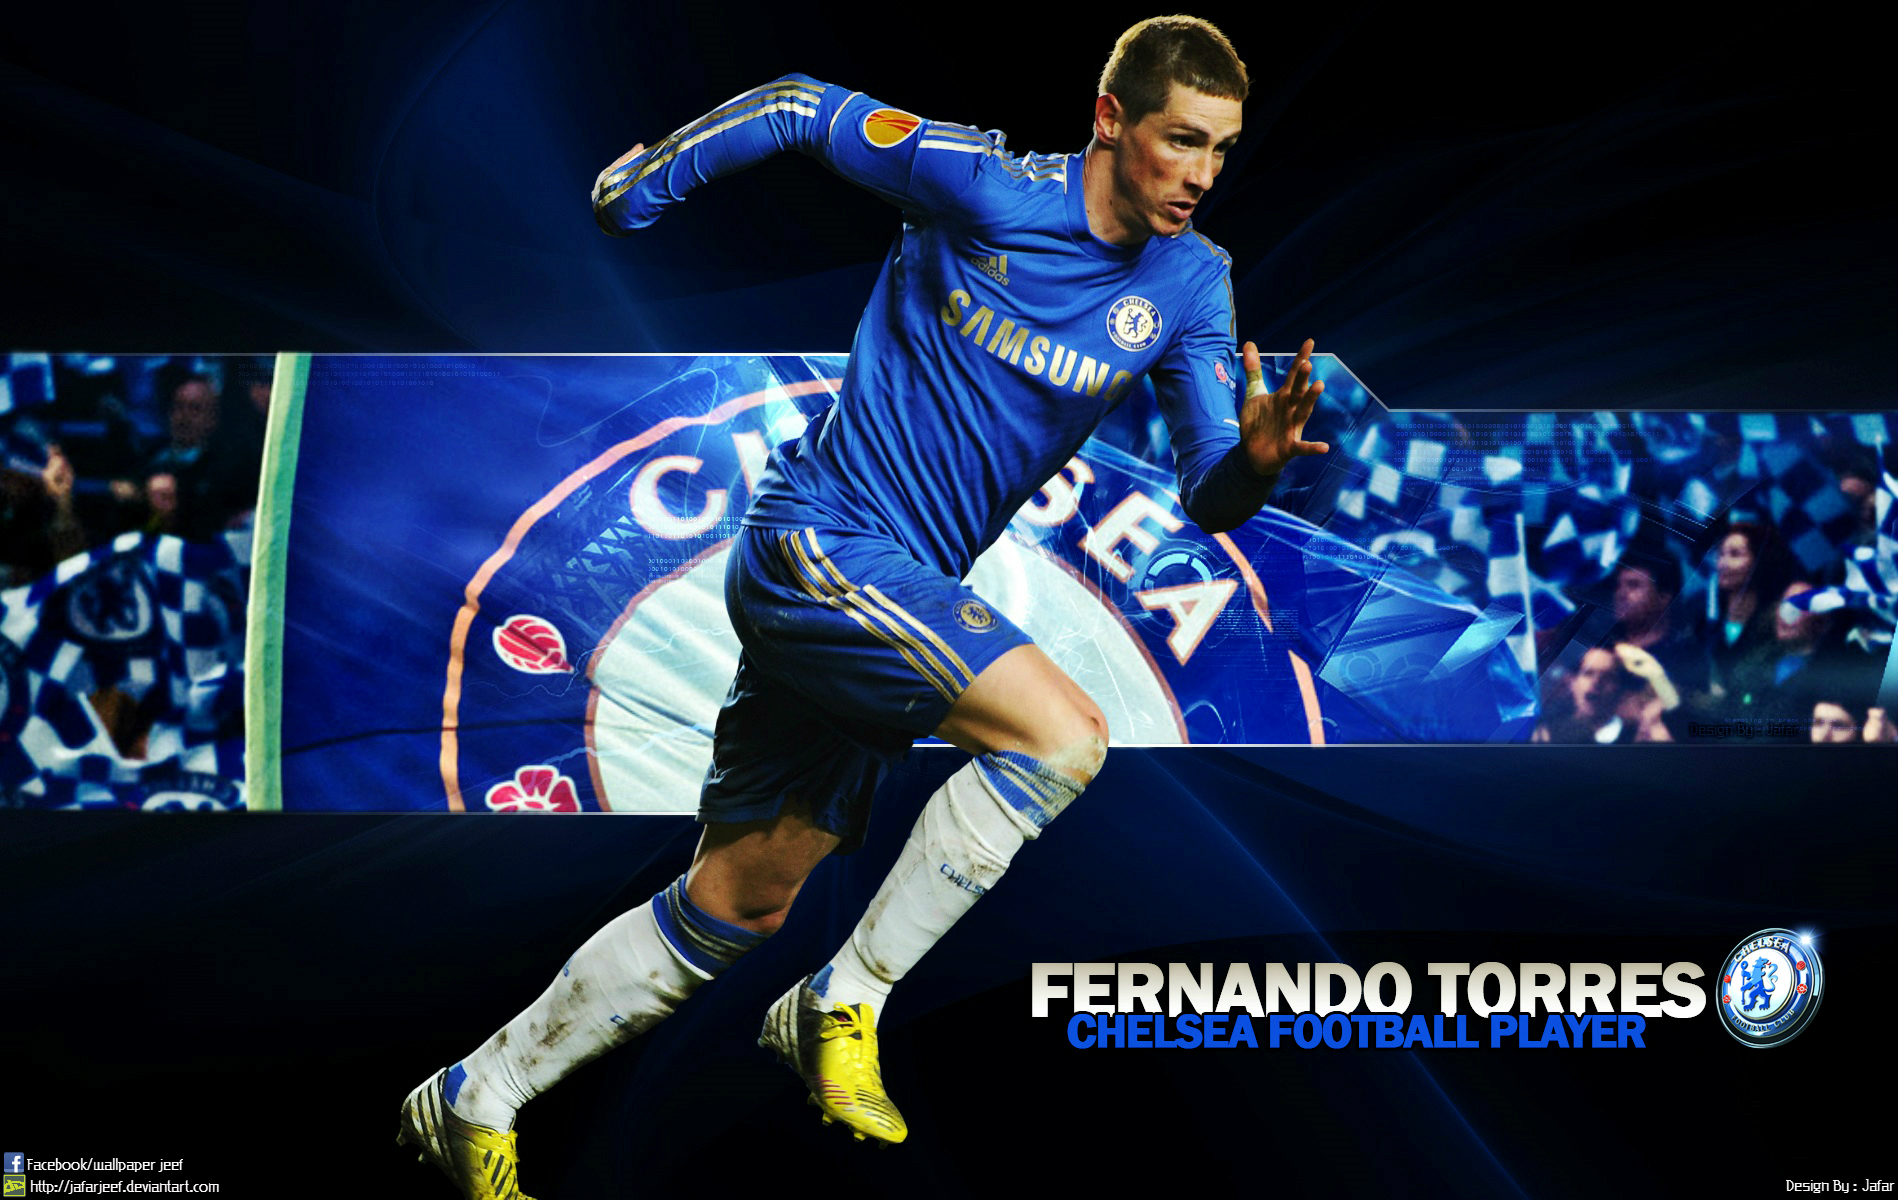 Fernando Torres Desktop Wallpaper   Football Wallpaper HD 1898x1200